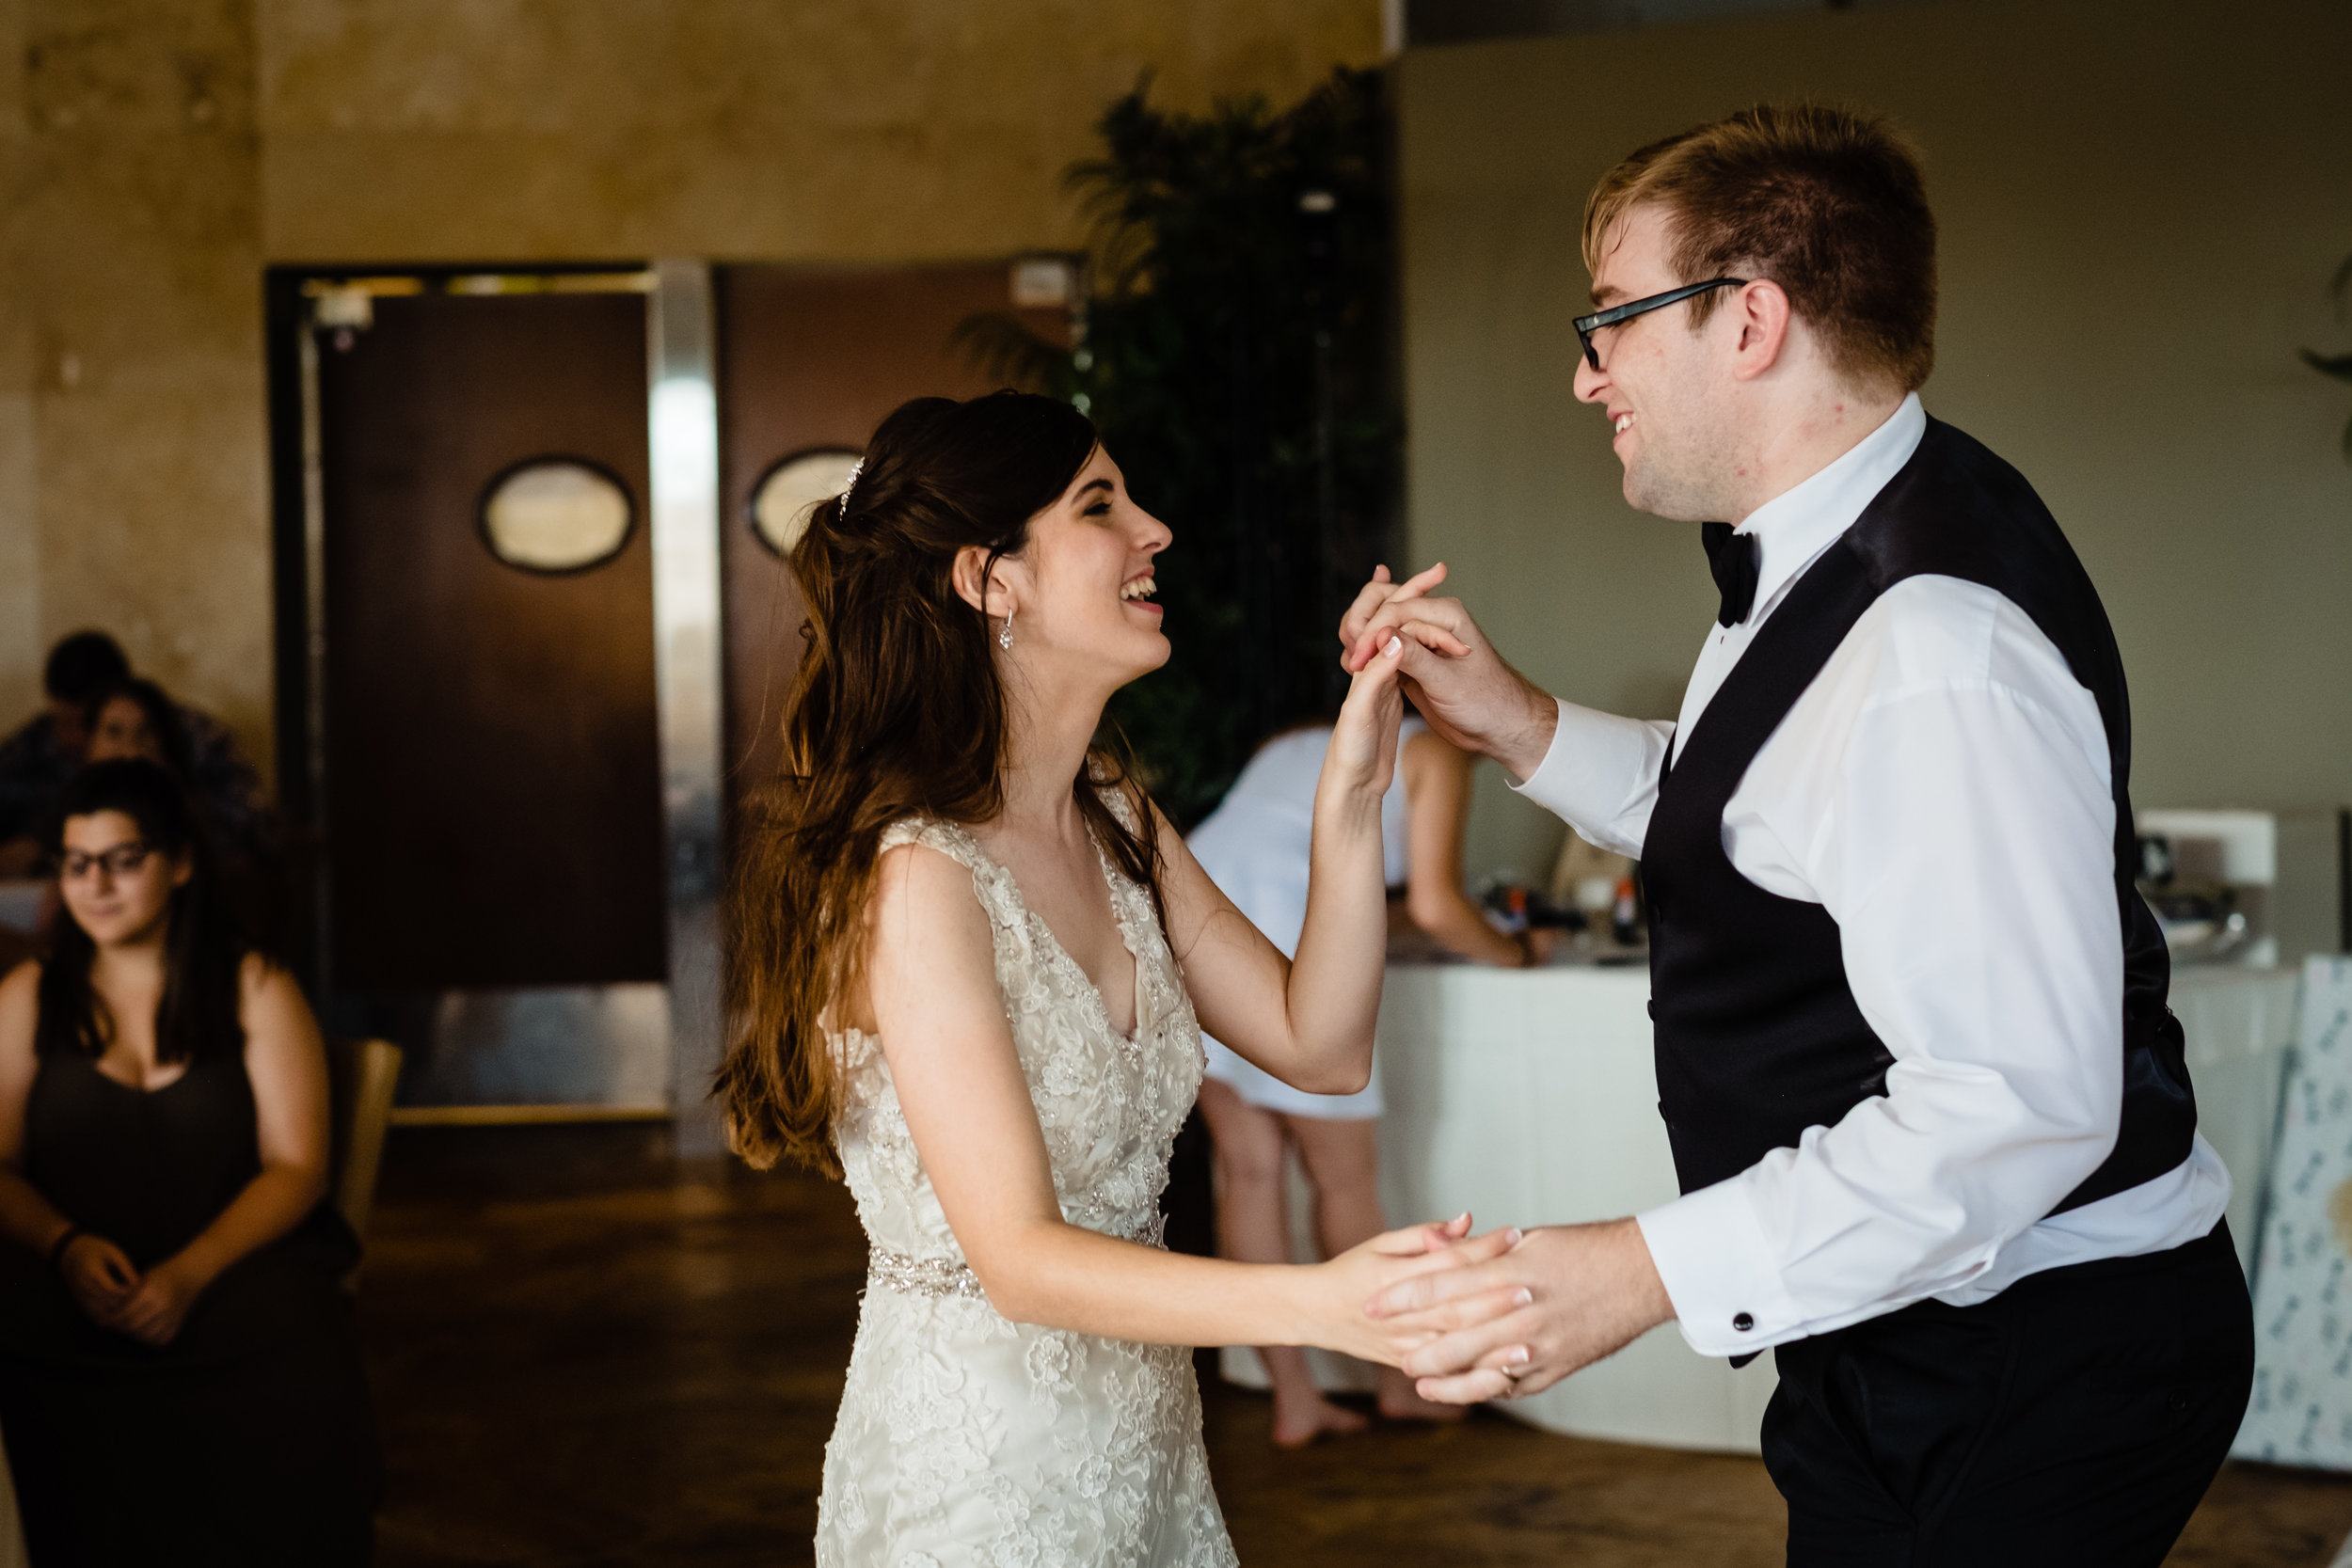 HAH_Zoe and Daniel_Clearwater Wedding_683_2018.jpg